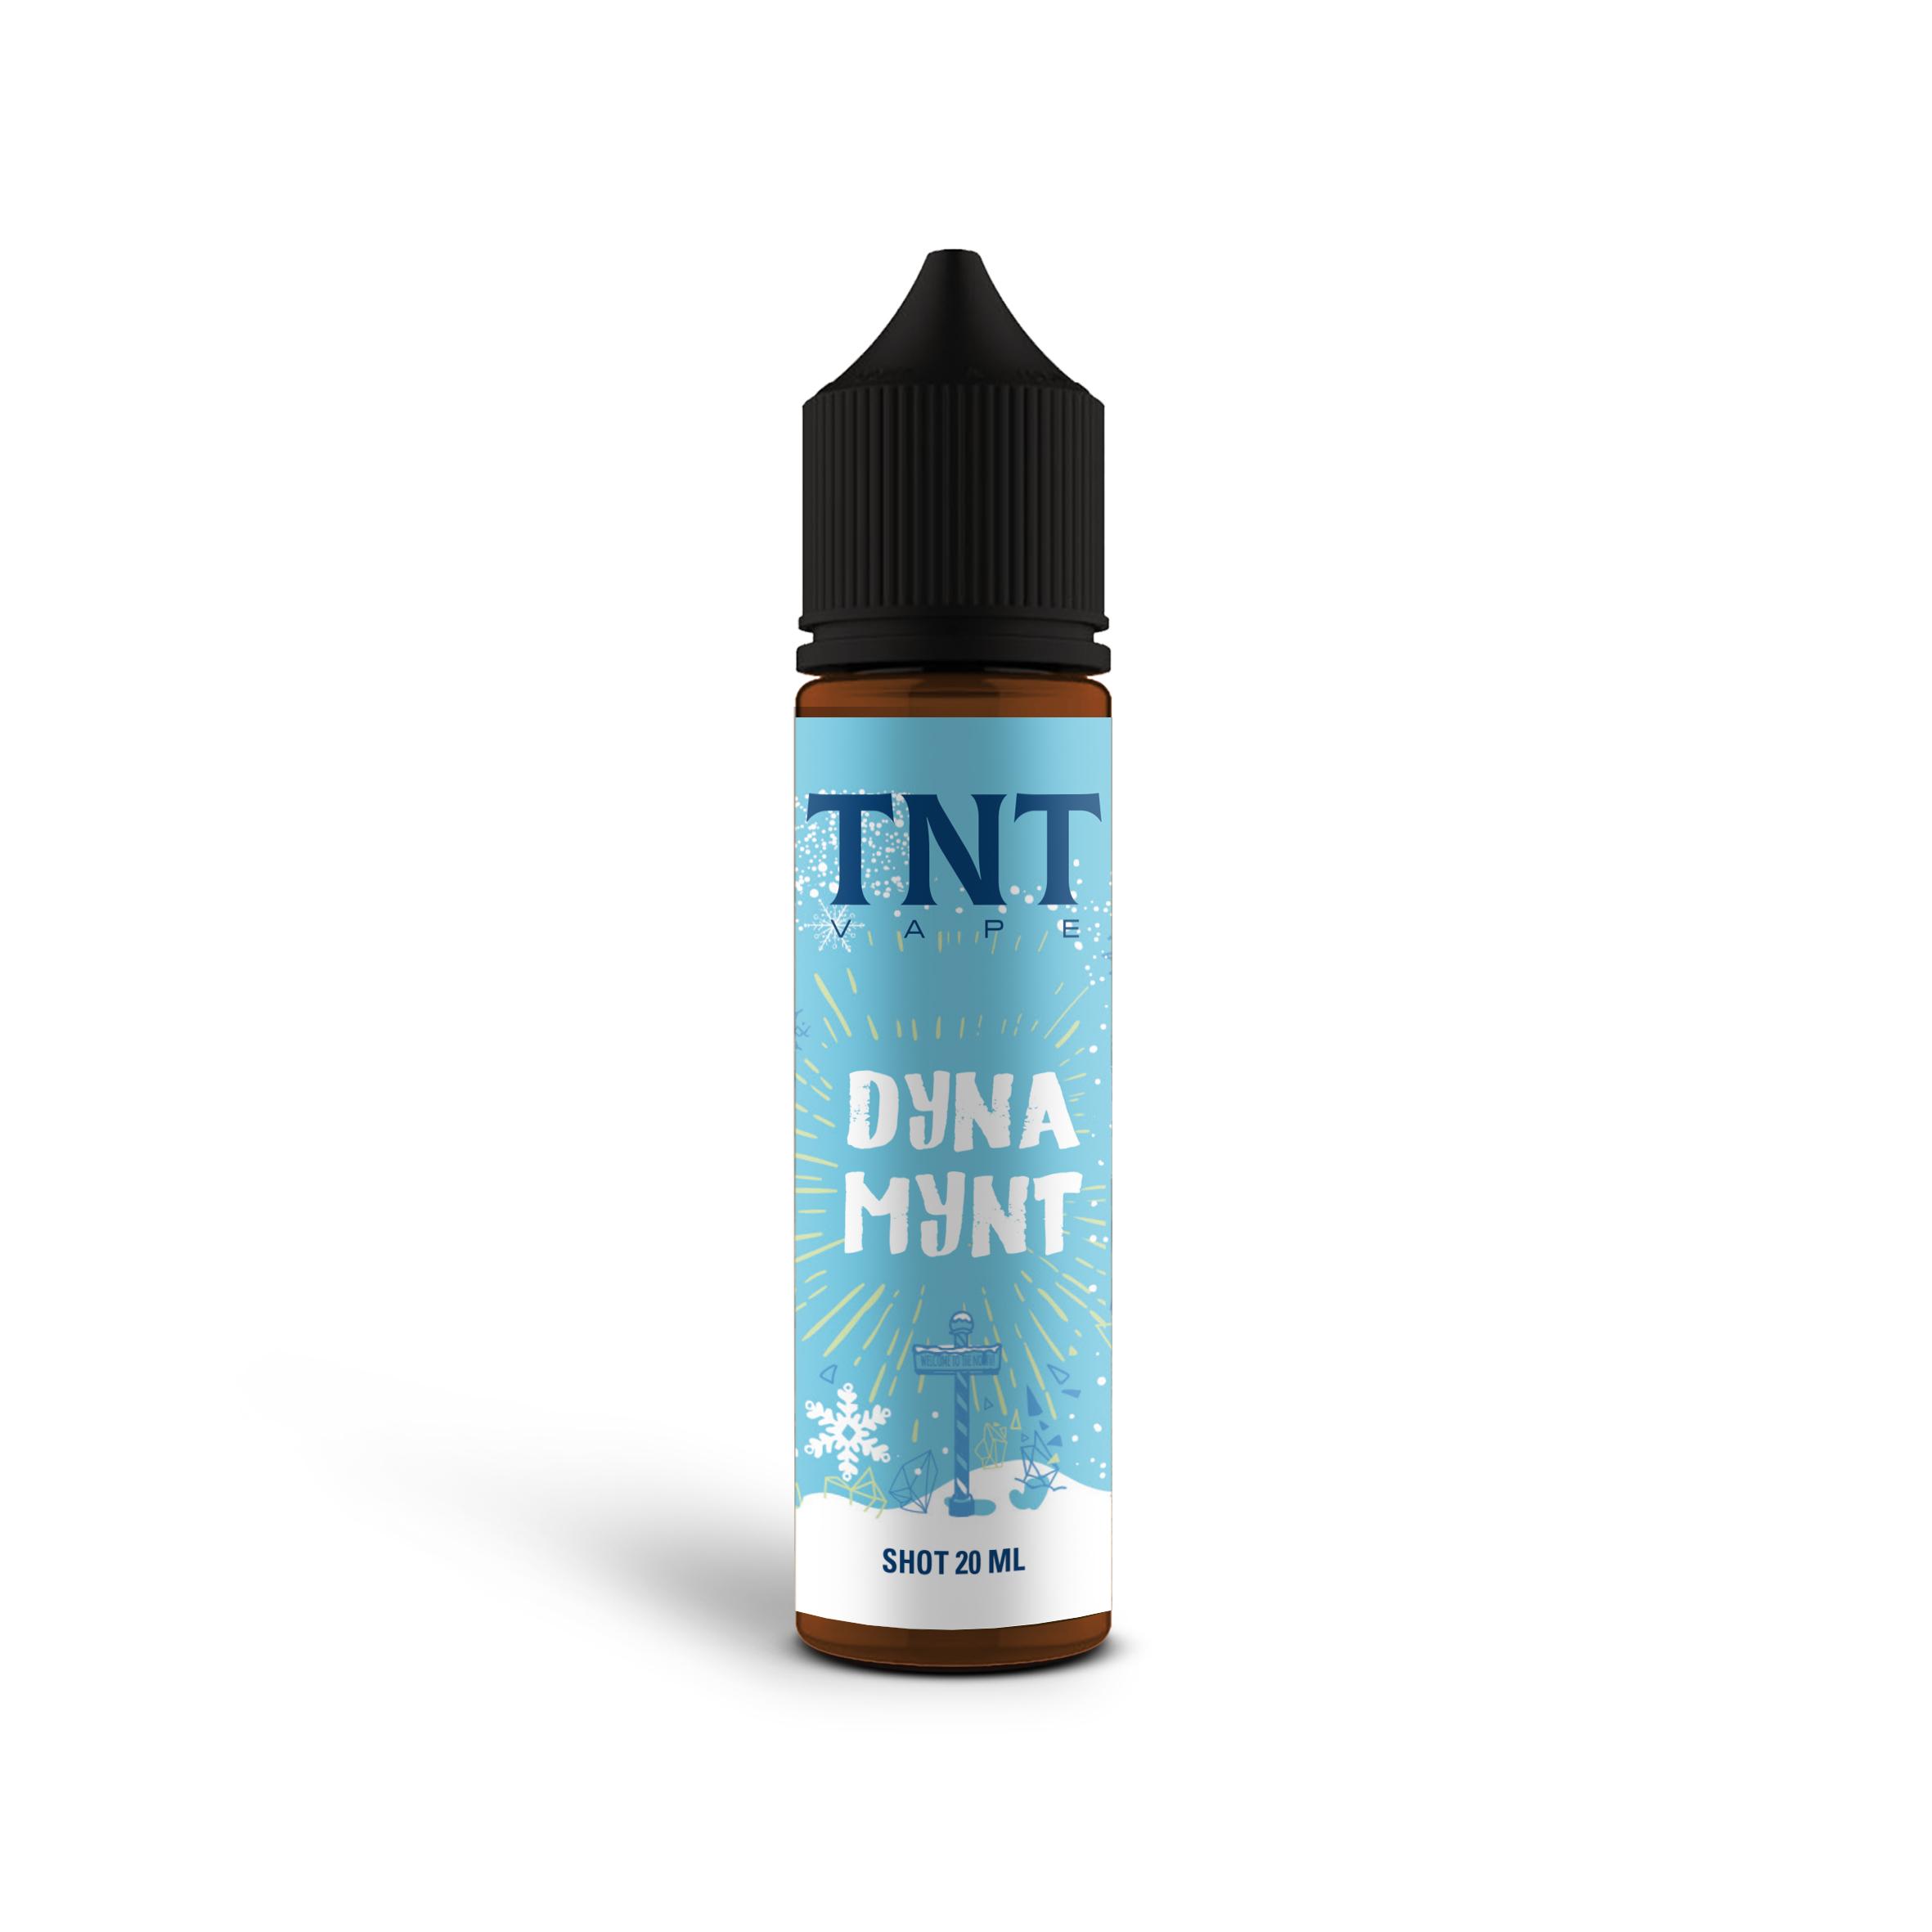 Tnt Vape Dyna Mynt Aroma Istantaneo 20ml